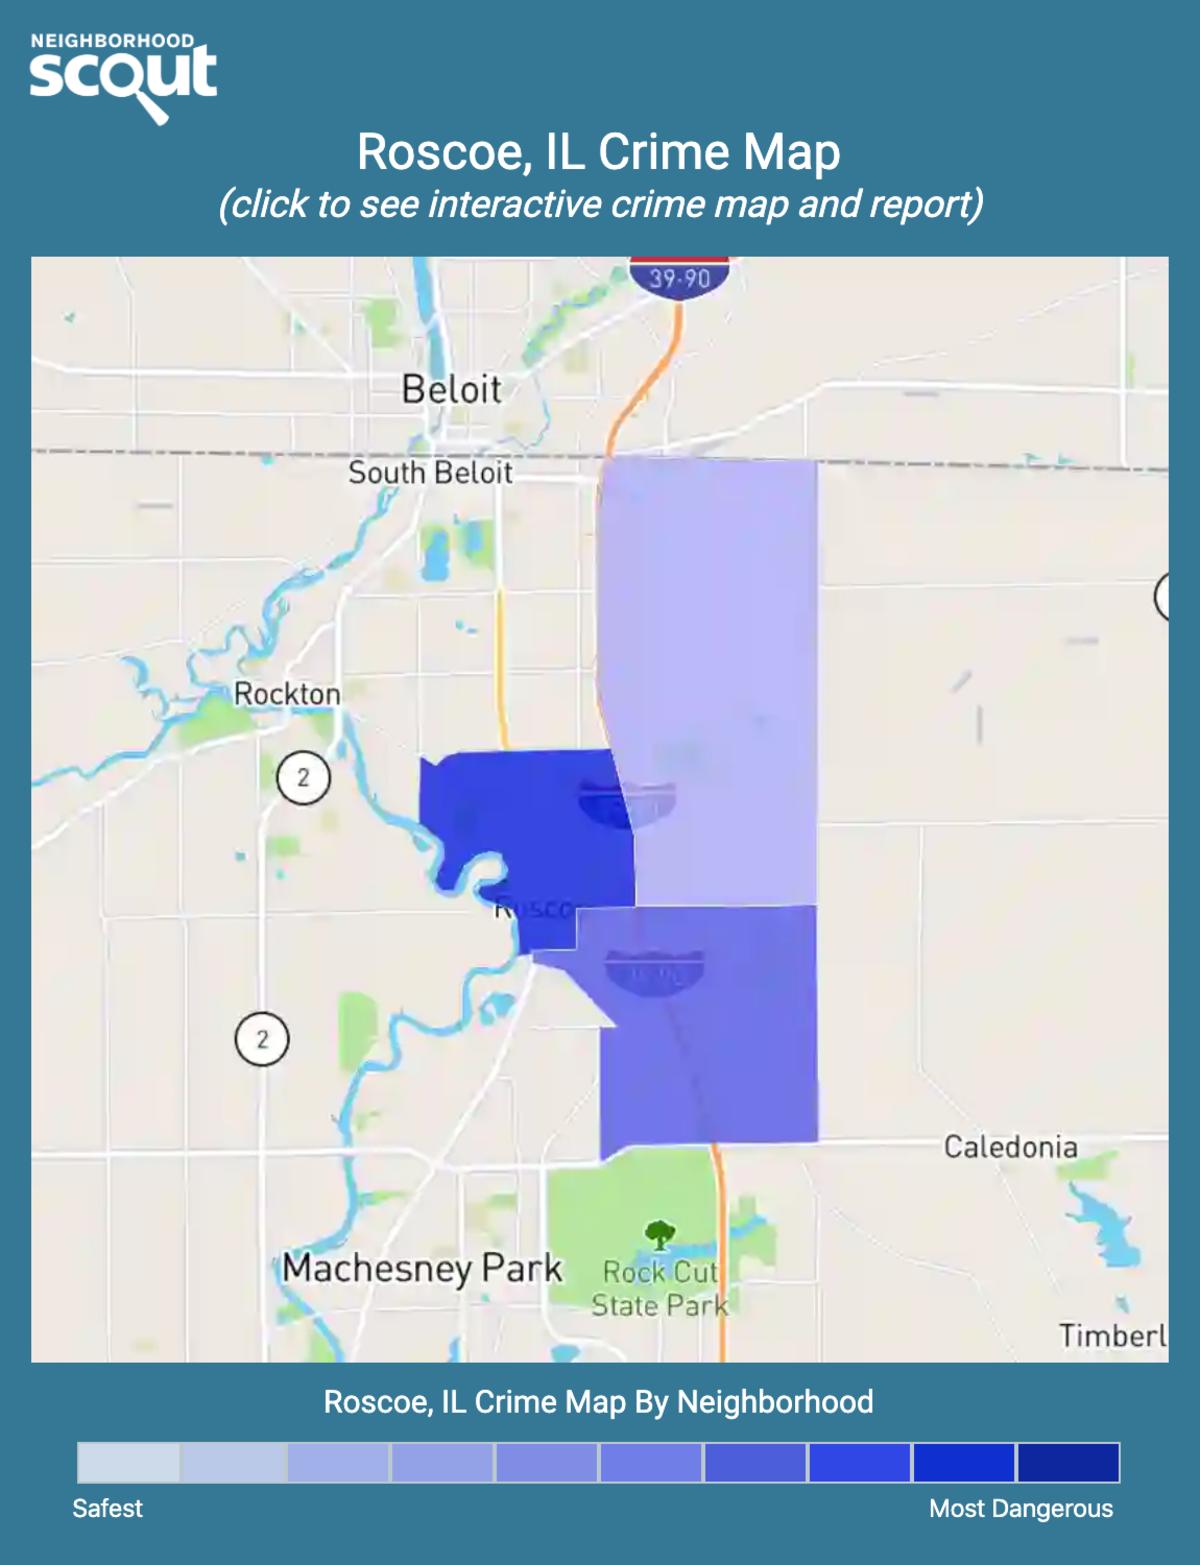 Roscoe, Illinois crime map